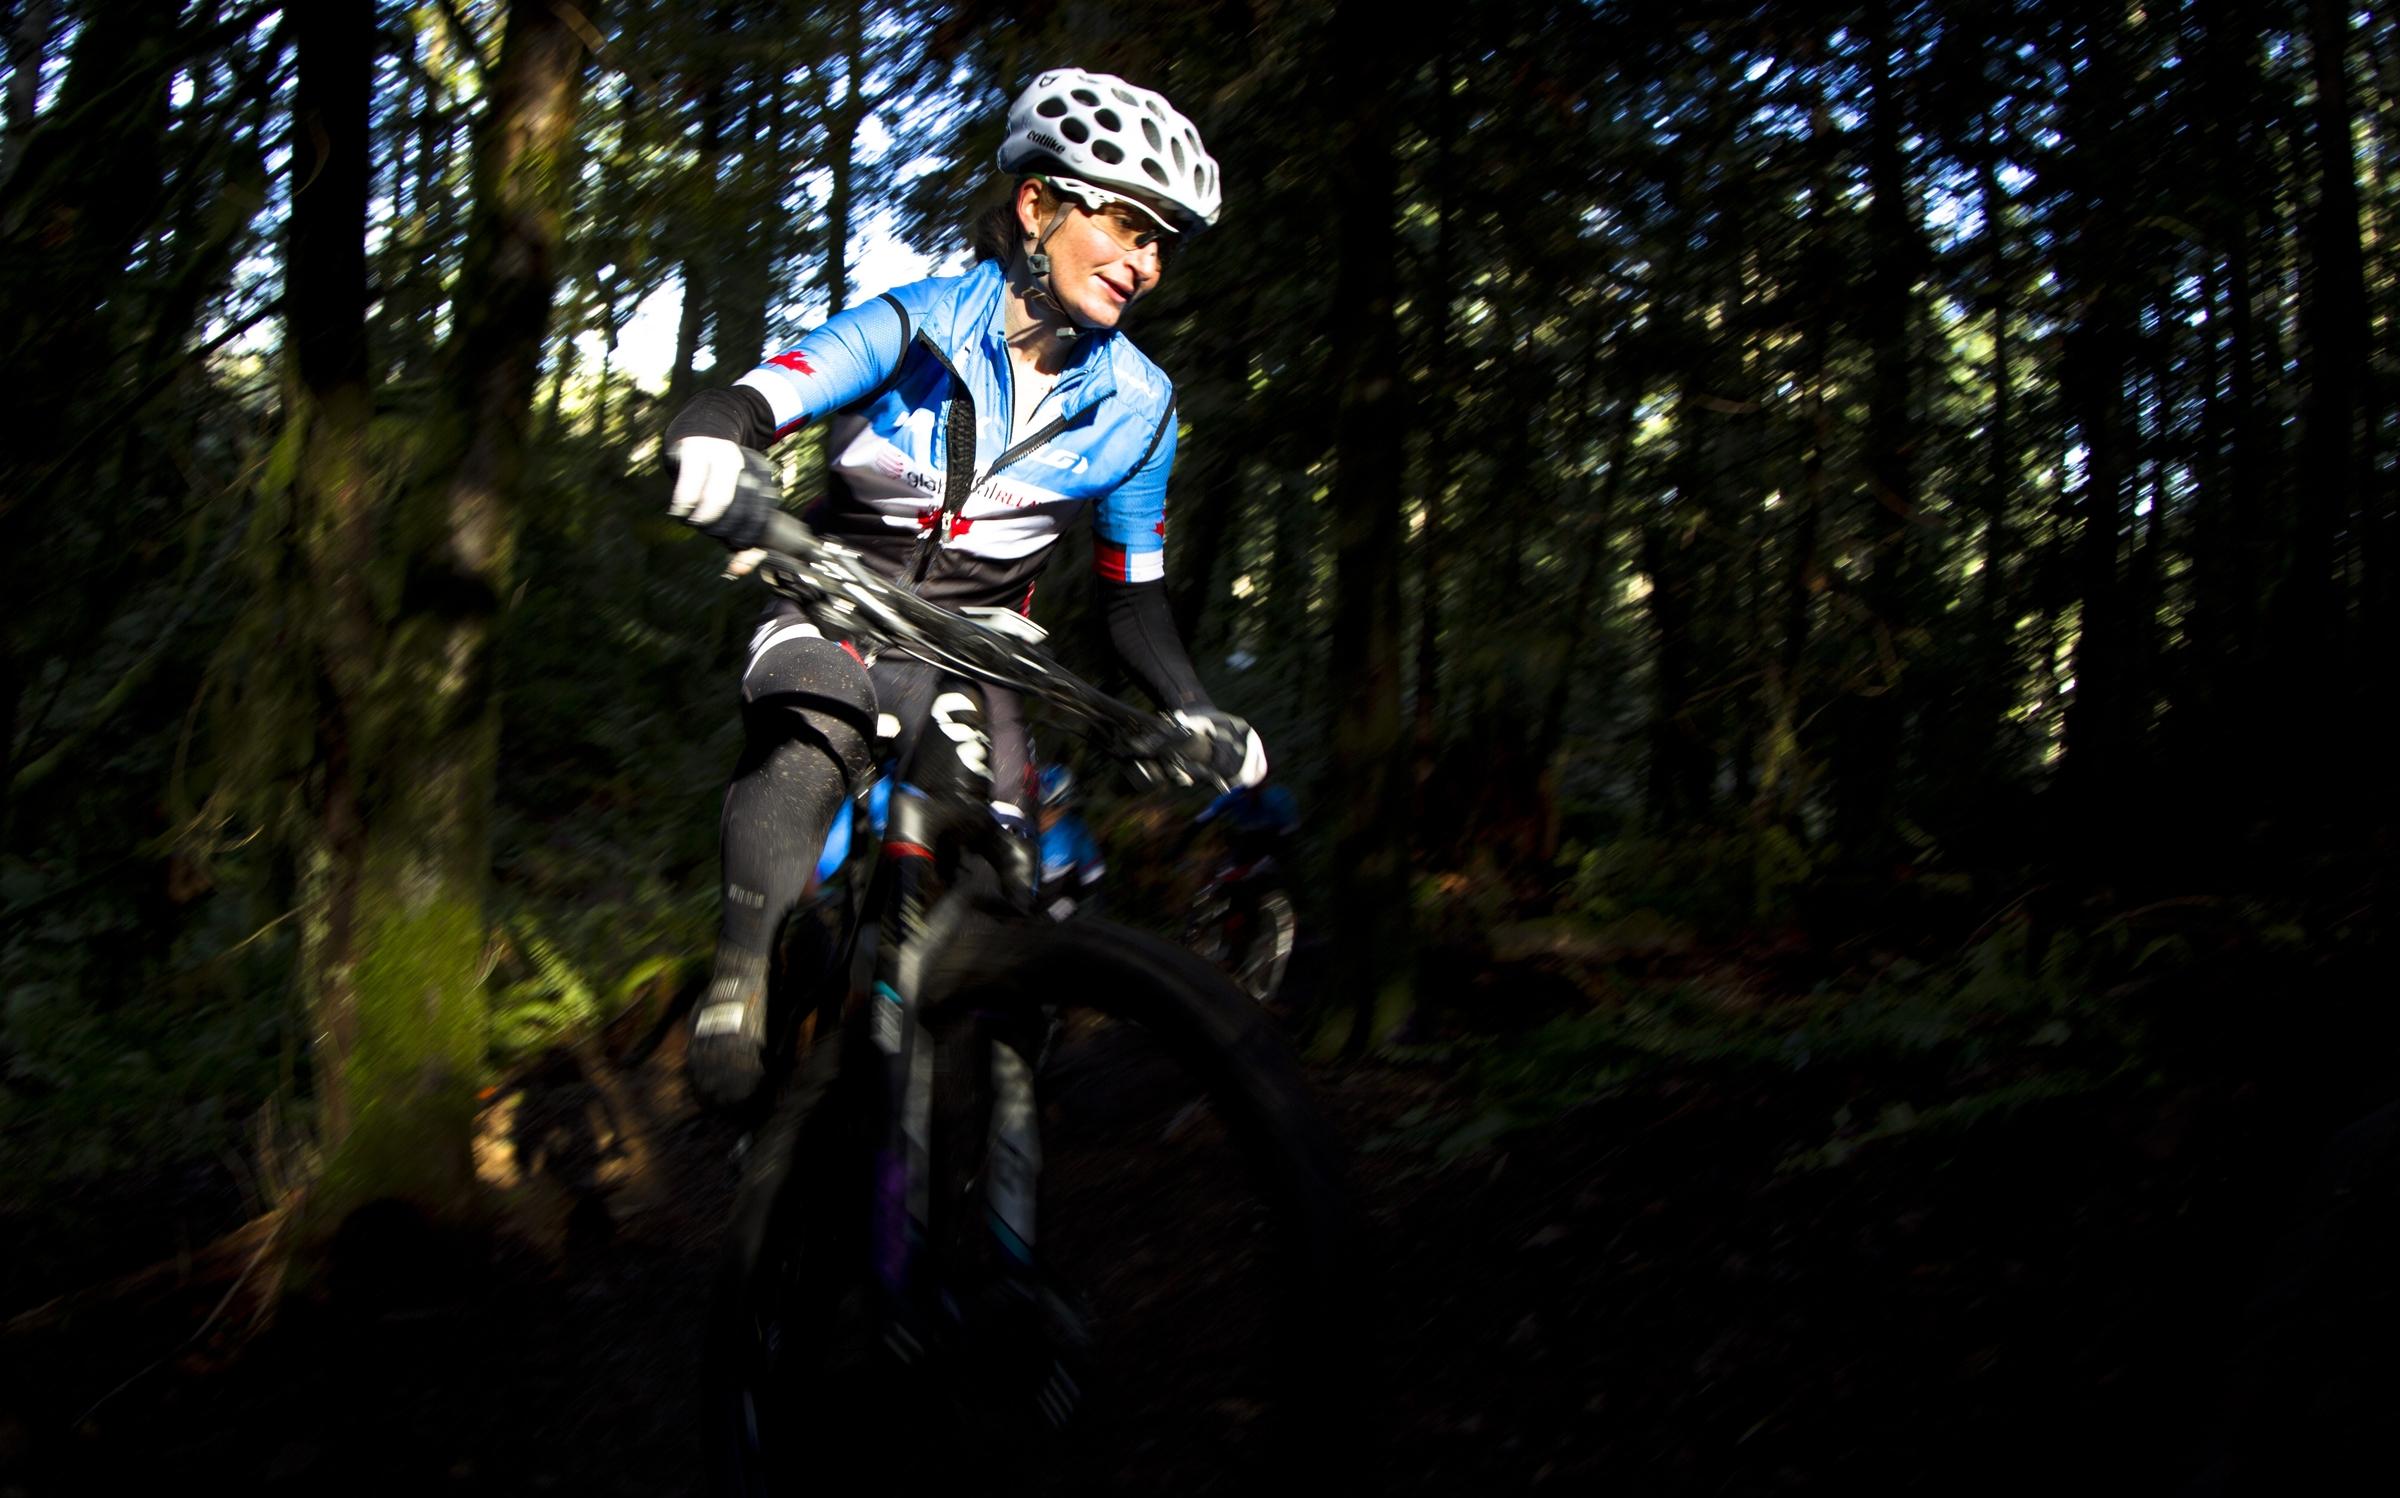 canadian-mountain-bike-team-feb-23-2015-kevinlightphoto_v0c8325